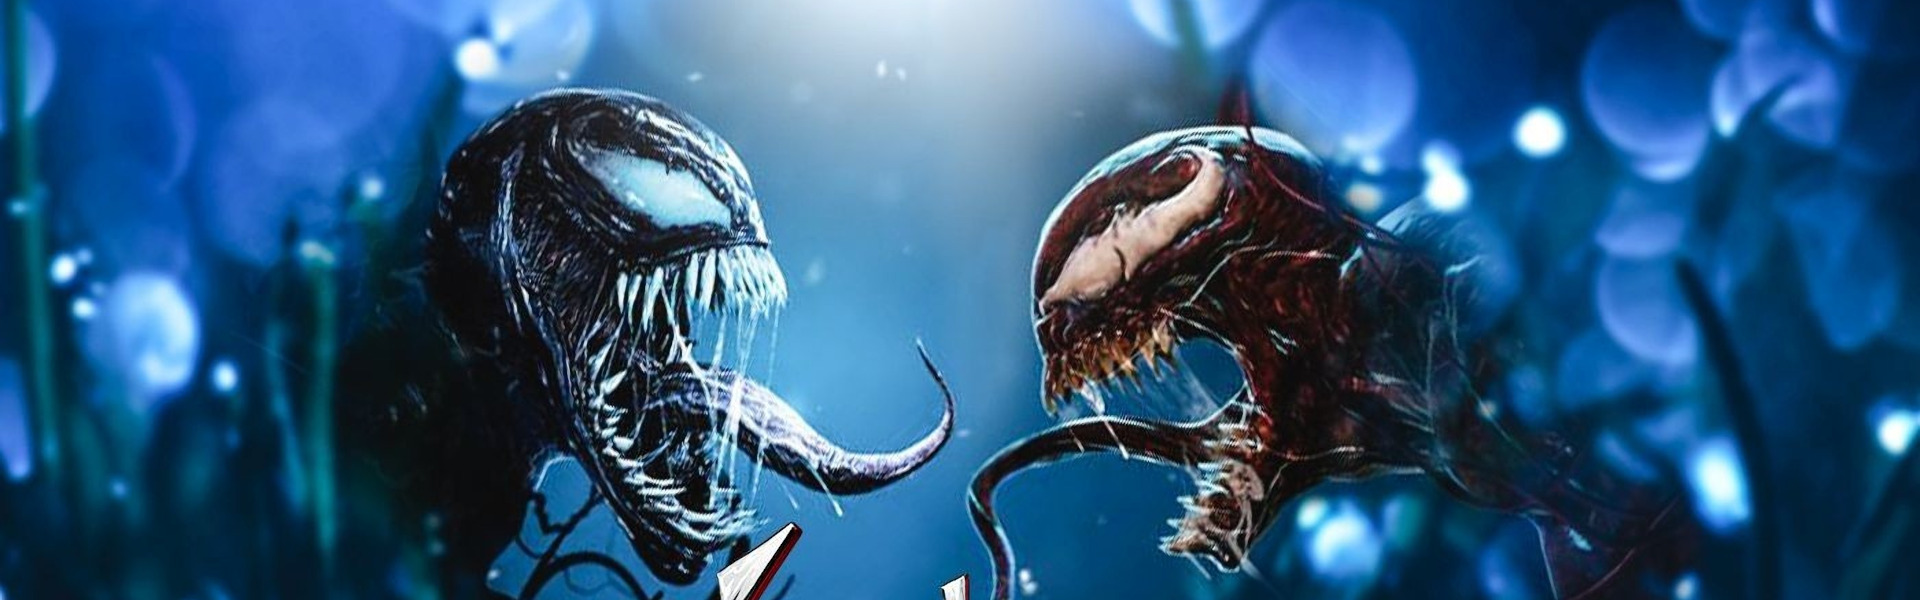 Venom 2: Carnage <span>(napisy)</span>